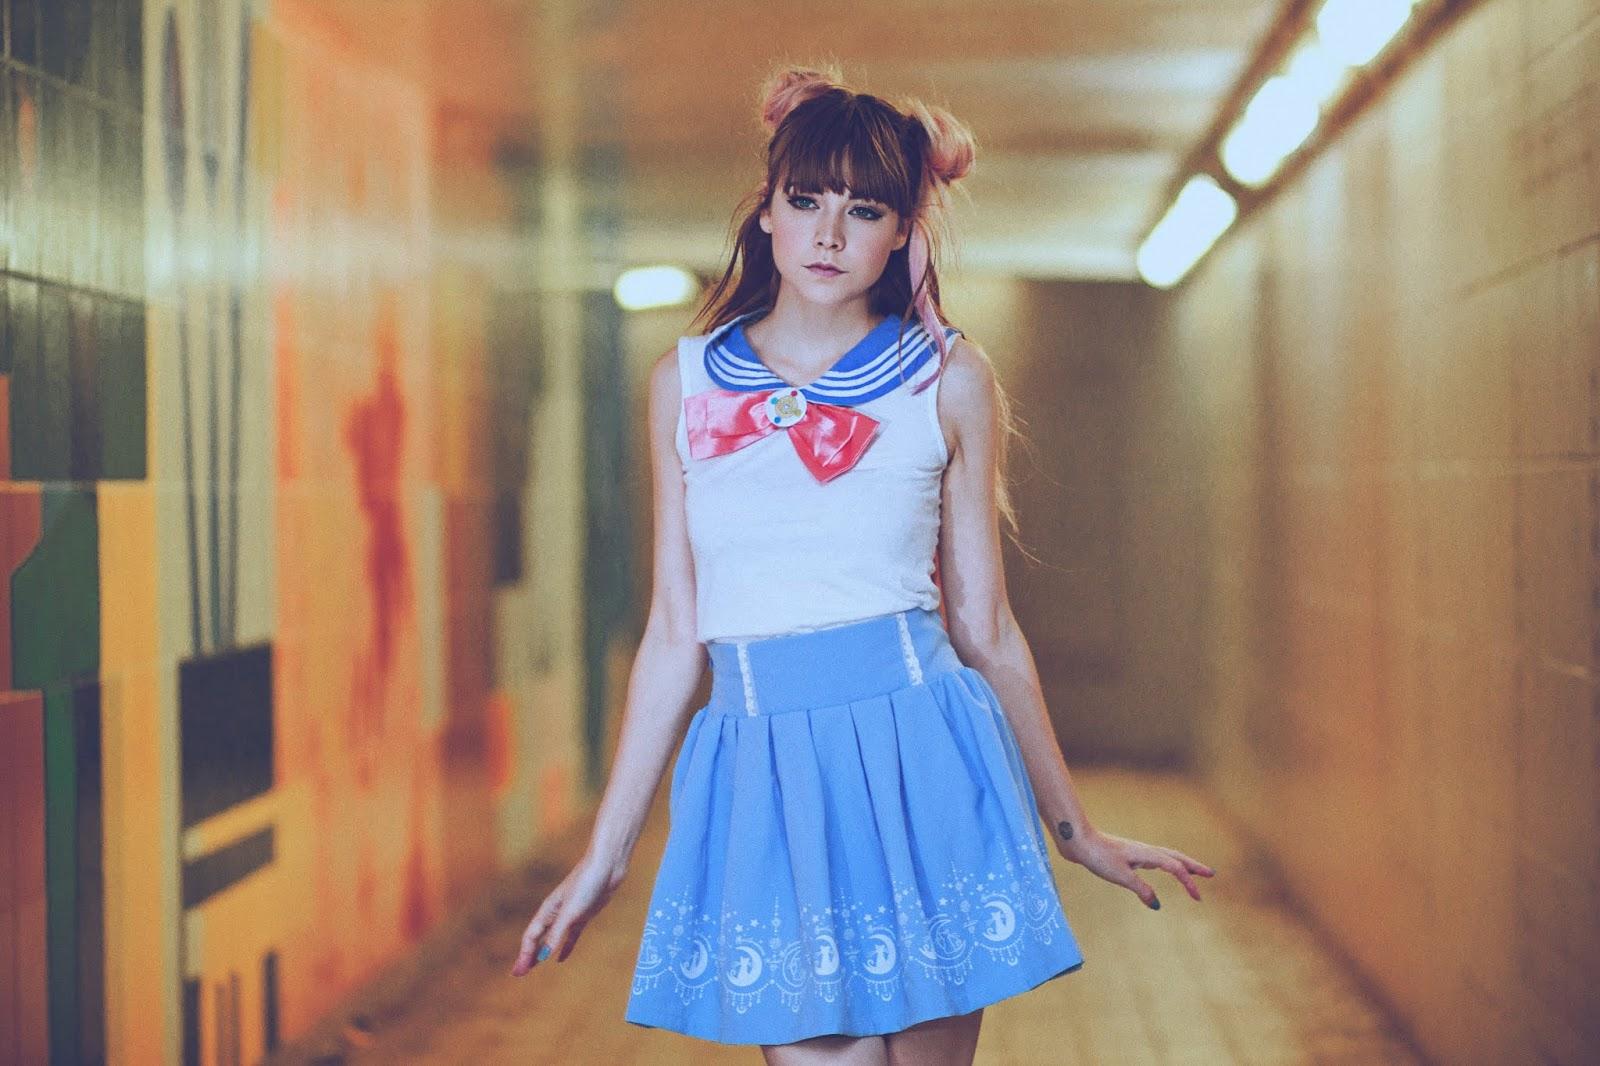 Hot and sexy anime girl